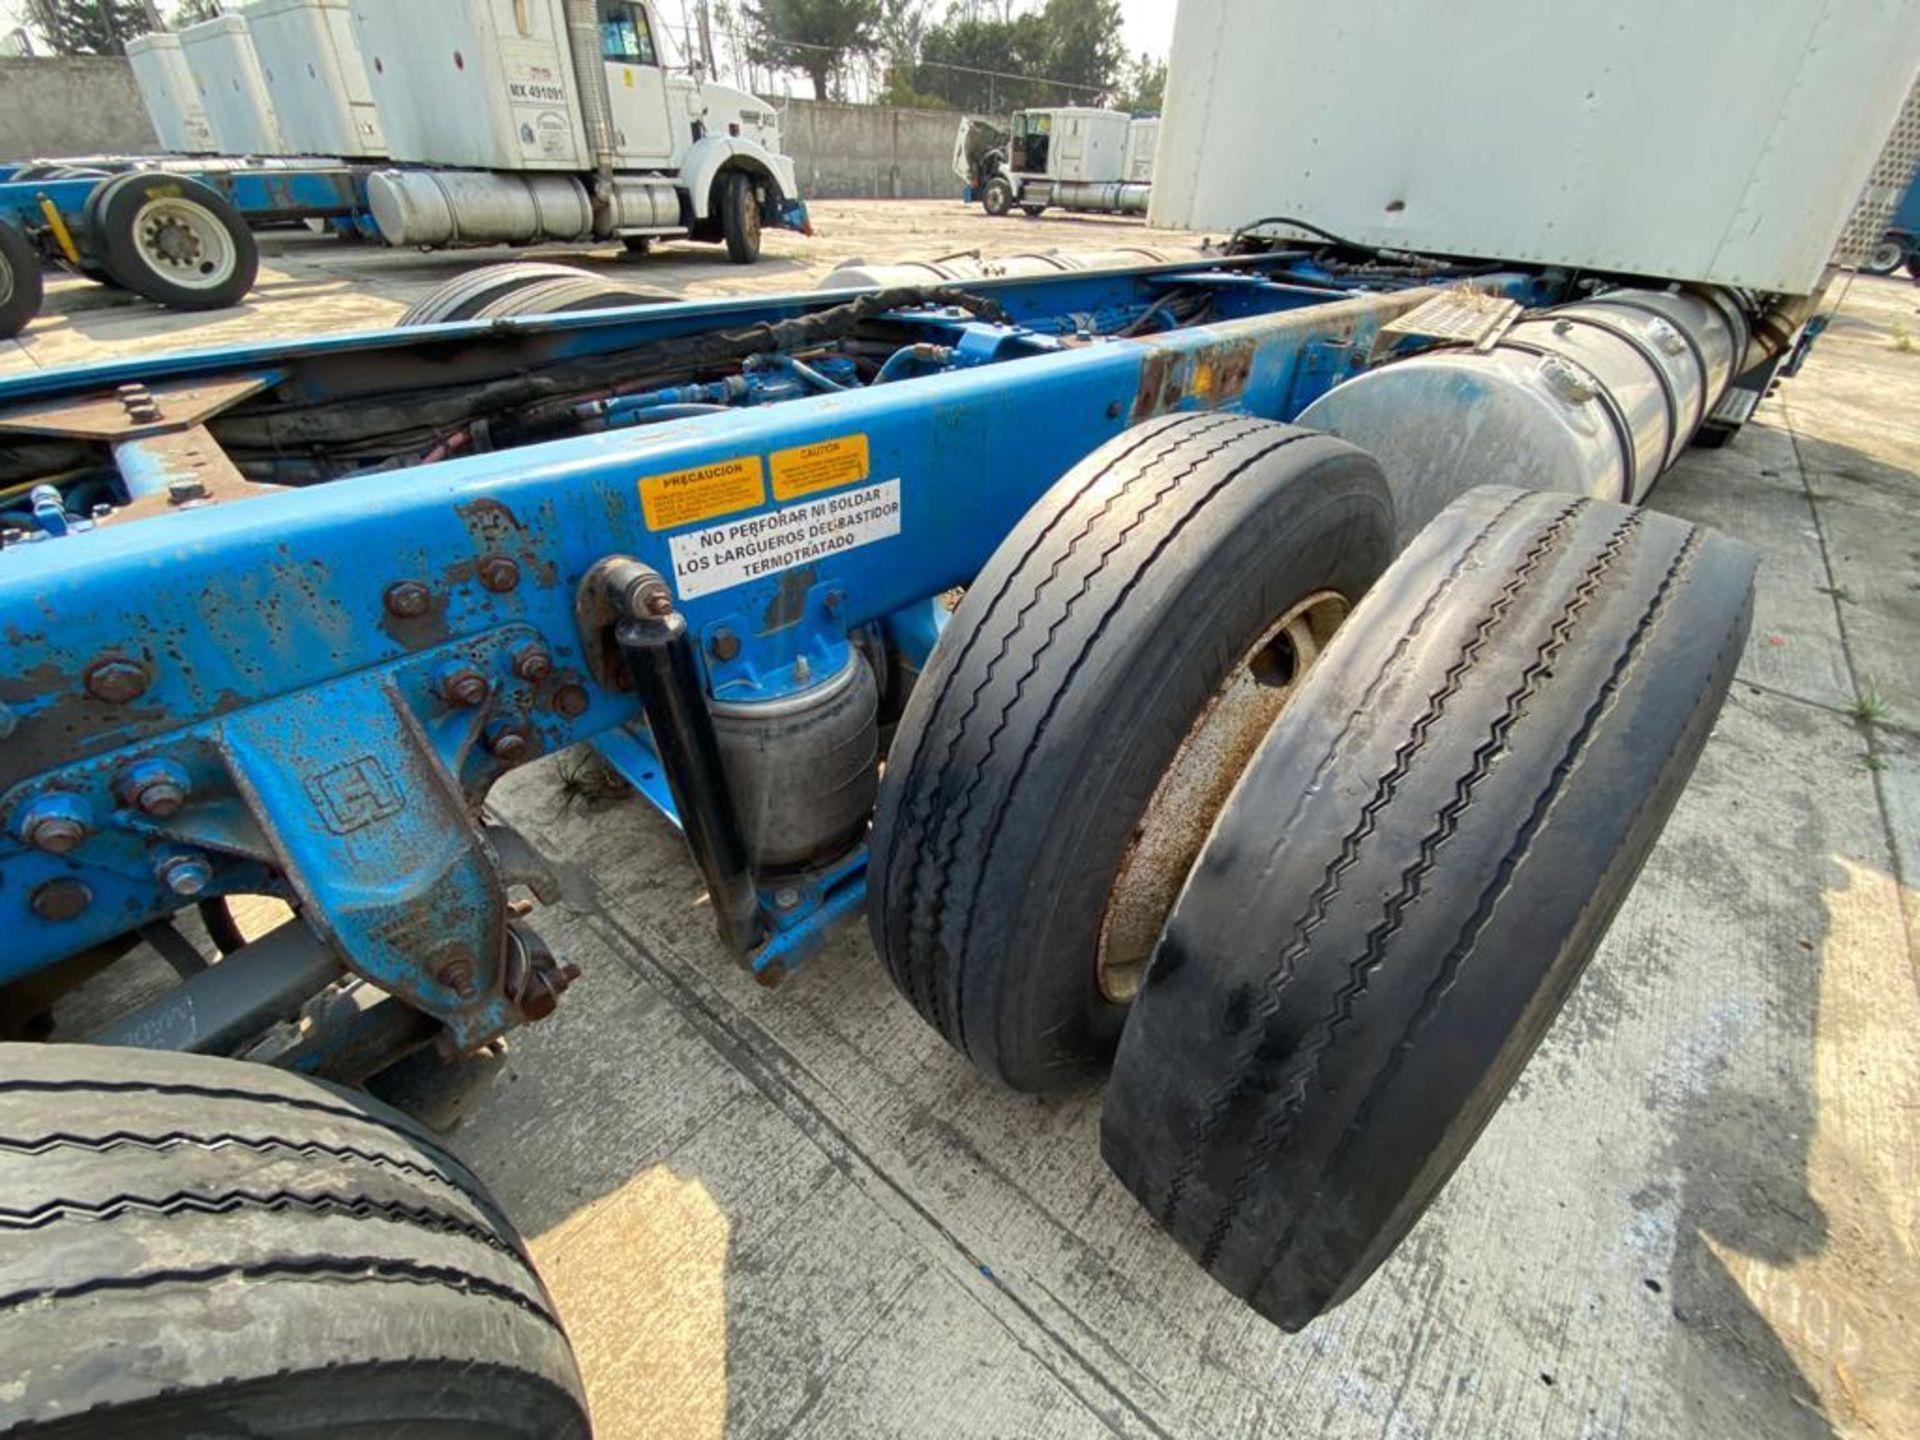 1999 Kenworth Sleeper truck tractor, standard transmission of 18 speeds - Image 27 of 75